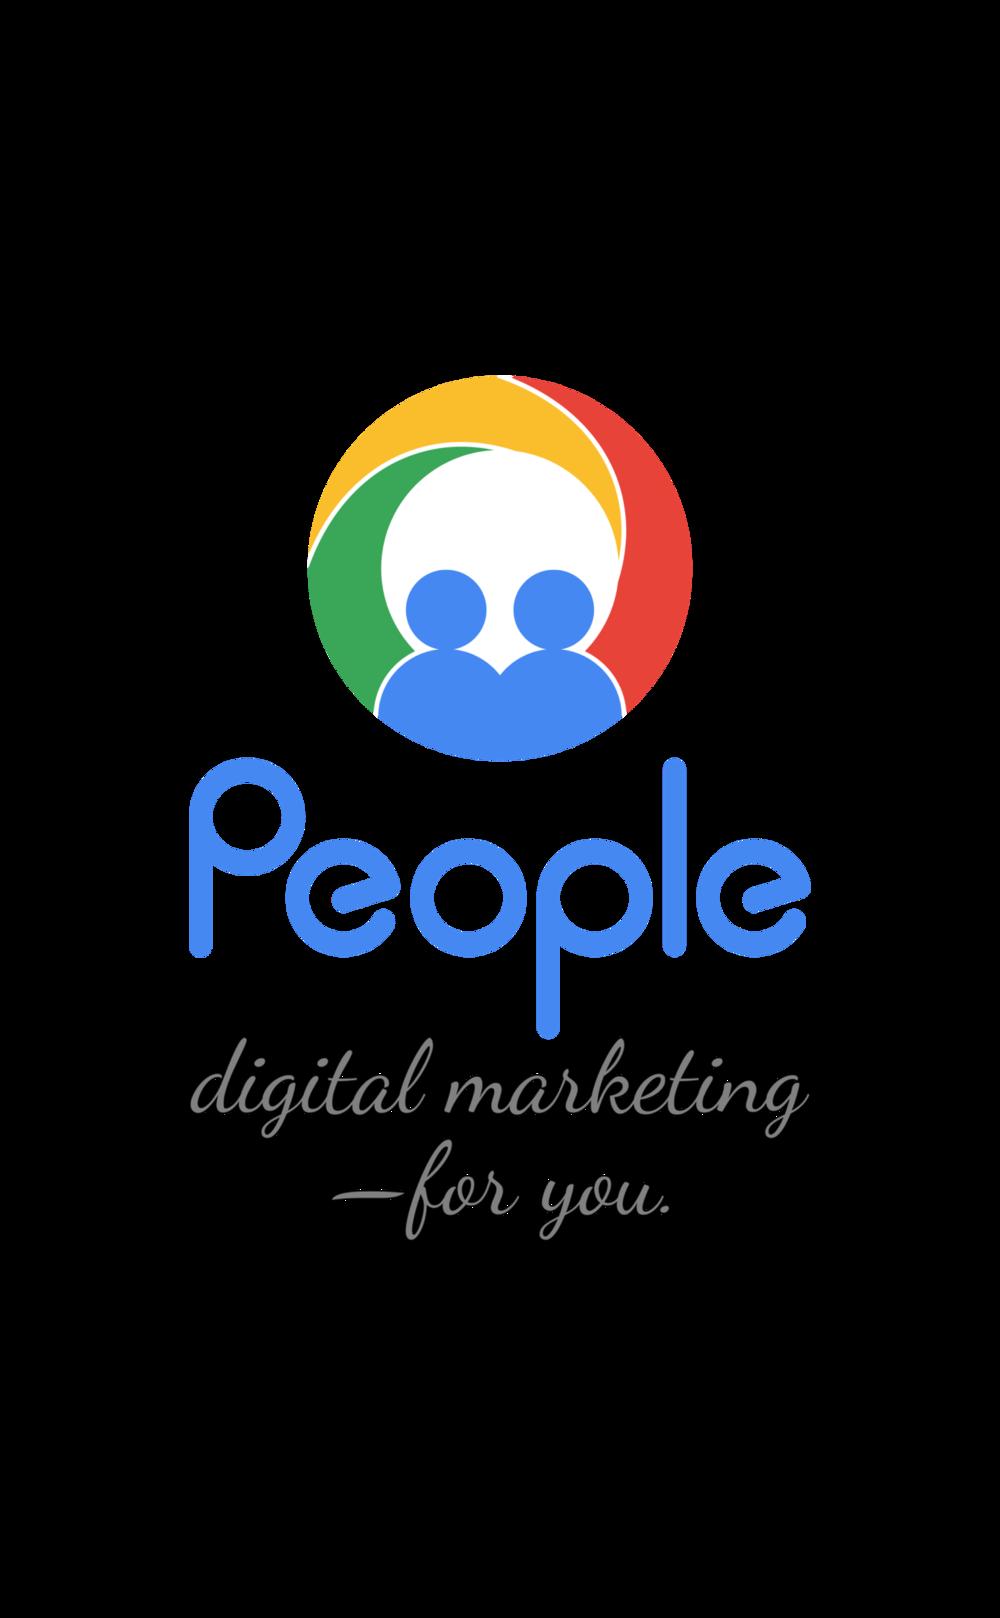 people_dm_digitalmarketing_digital_marketing_adwords_ads_online_social_socialmedia 1618.png